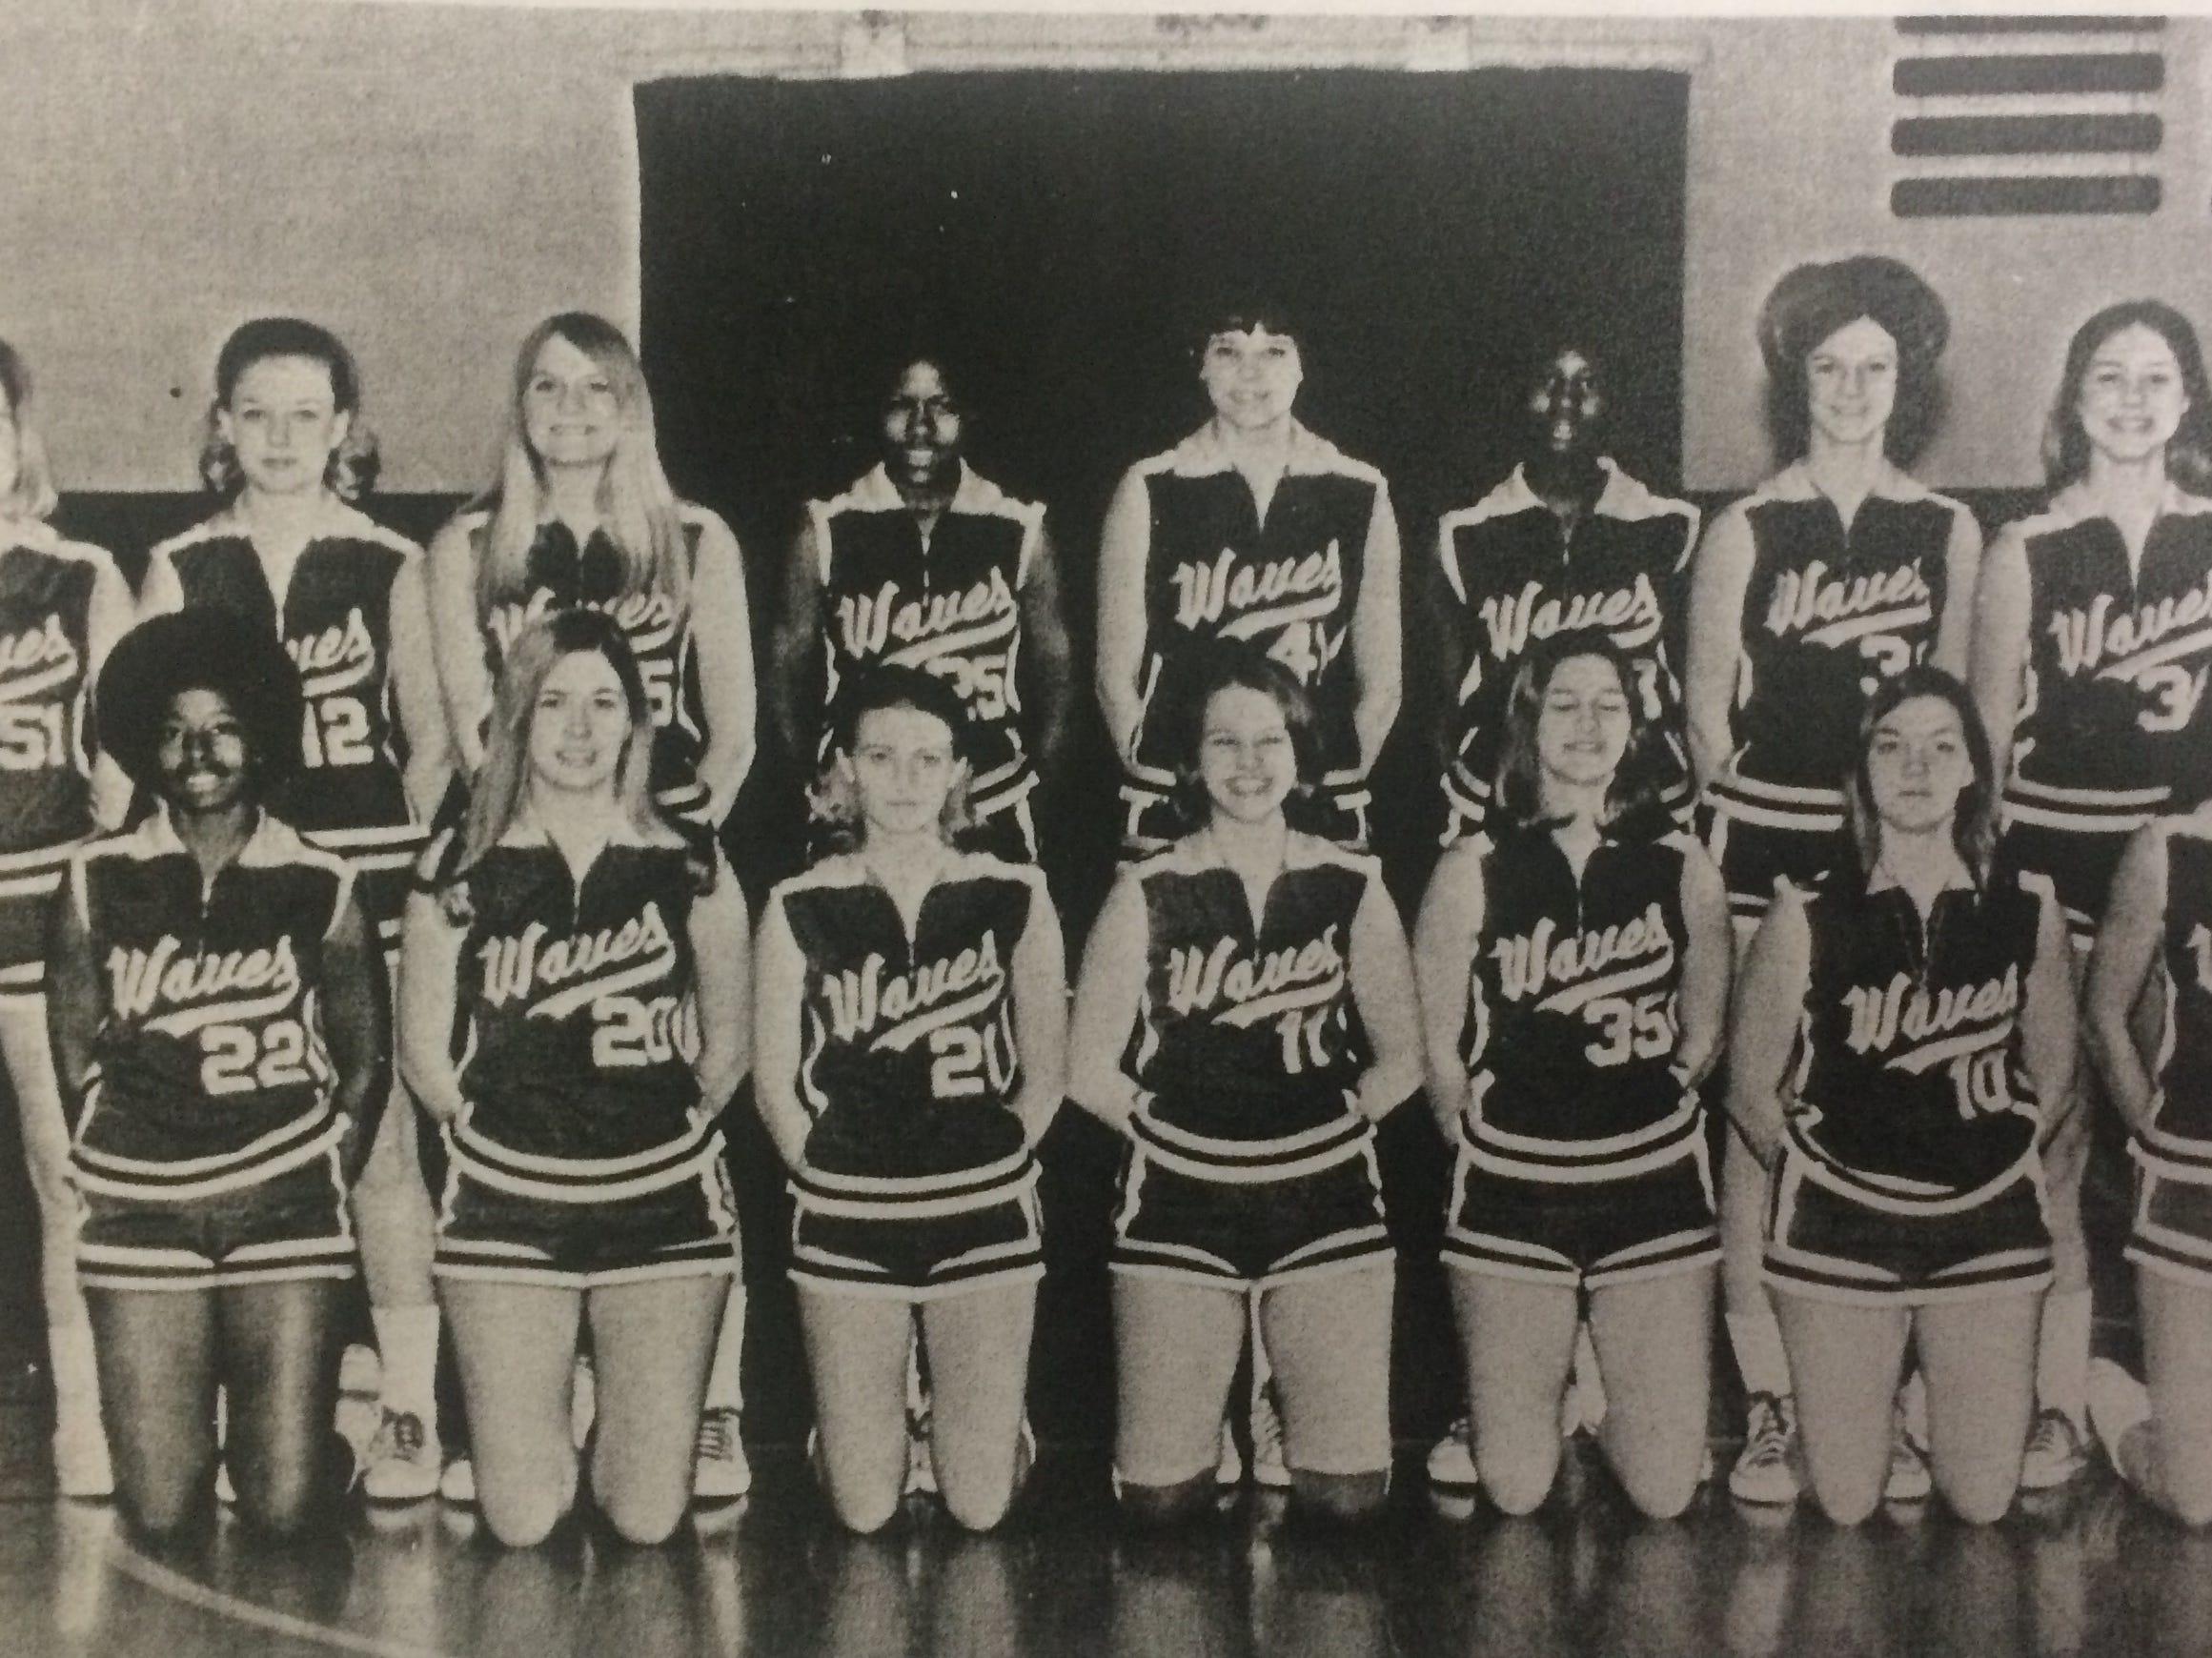 Gallatin High School 1970-71 girl's basketball team. Kneeling (L-R): Sylvia Bass, Pat Ridings, Kim Grizzle, Ruthie Langford, Susan Snyder, Sharon Snyder, Millie Parrish. Standing (L-R): Leila Jones, Clydell Parker, Debra Hall, Eula Cartwright, Leslie Campbell, Deloris Ligon, Connie Woodard, Suzanne Boze.